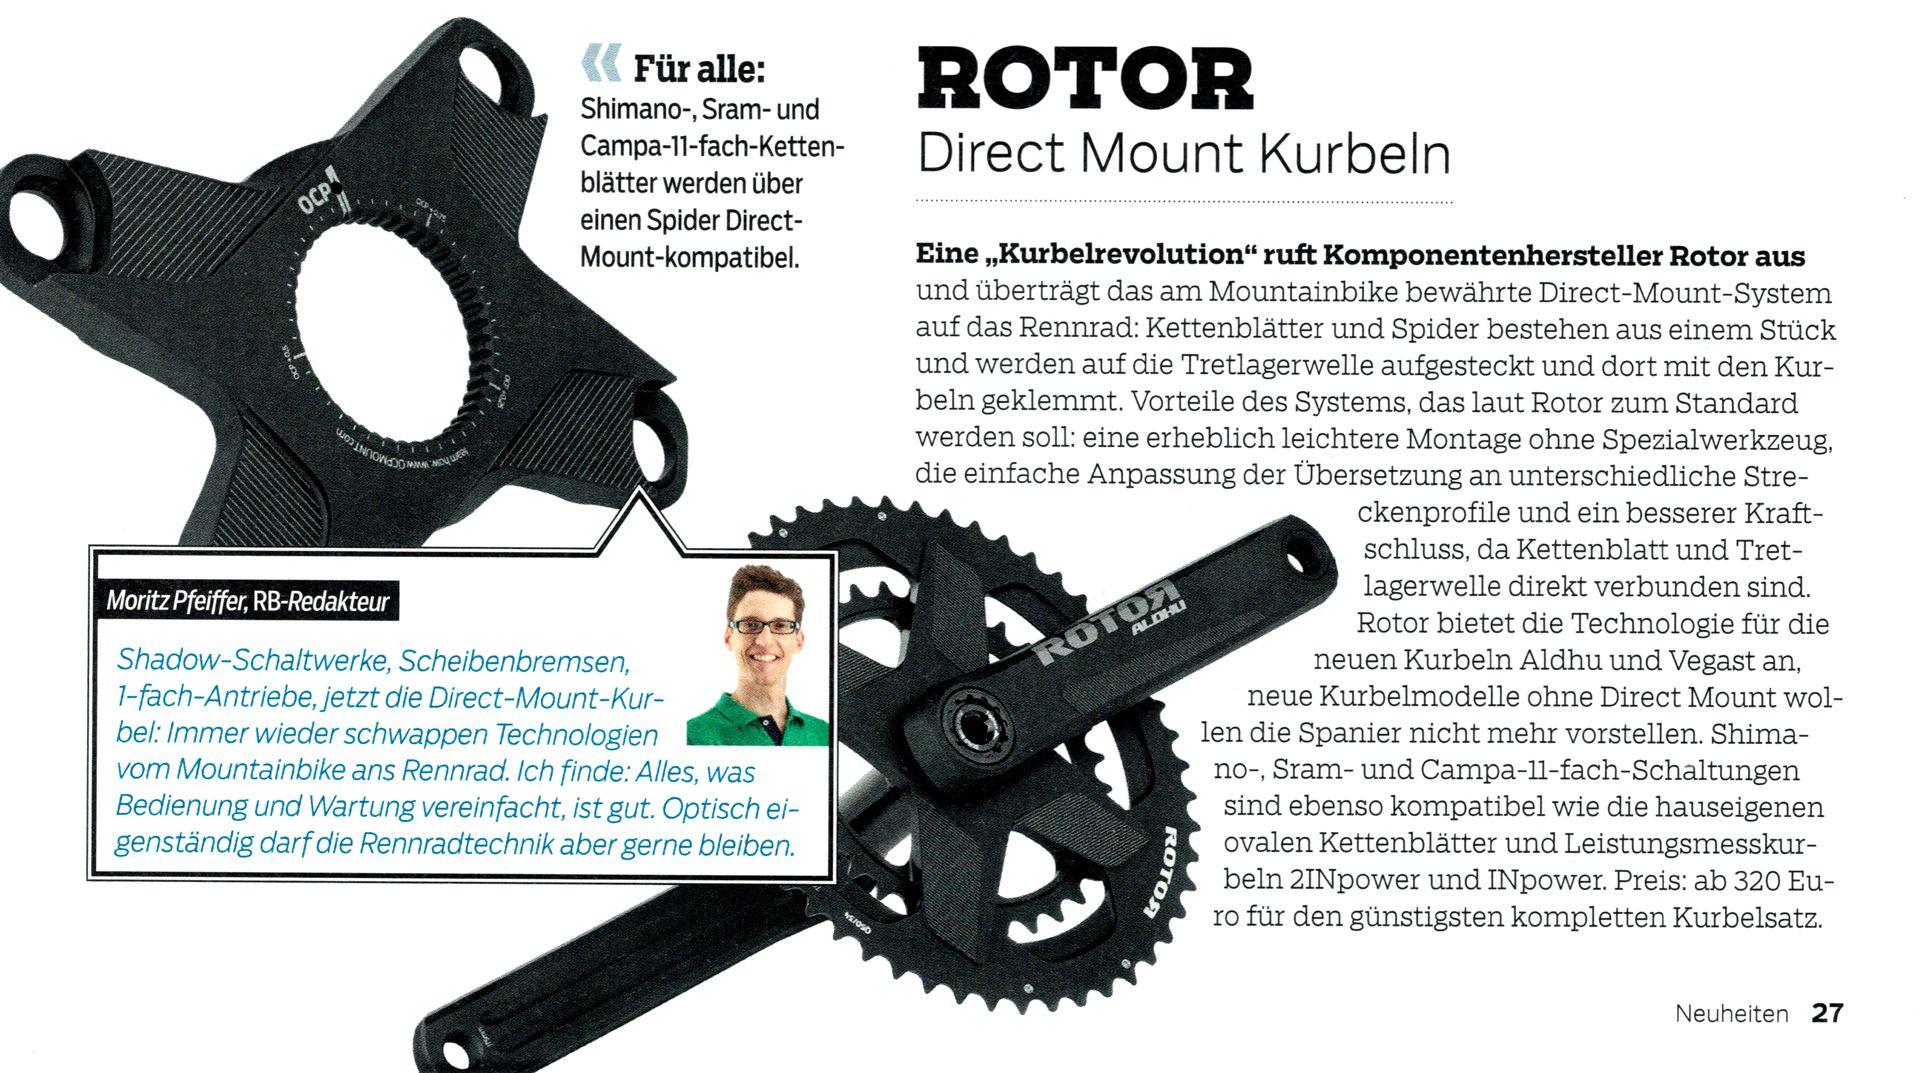 Roadbike kommentiert Direct Mount Kurbeln von Rotor